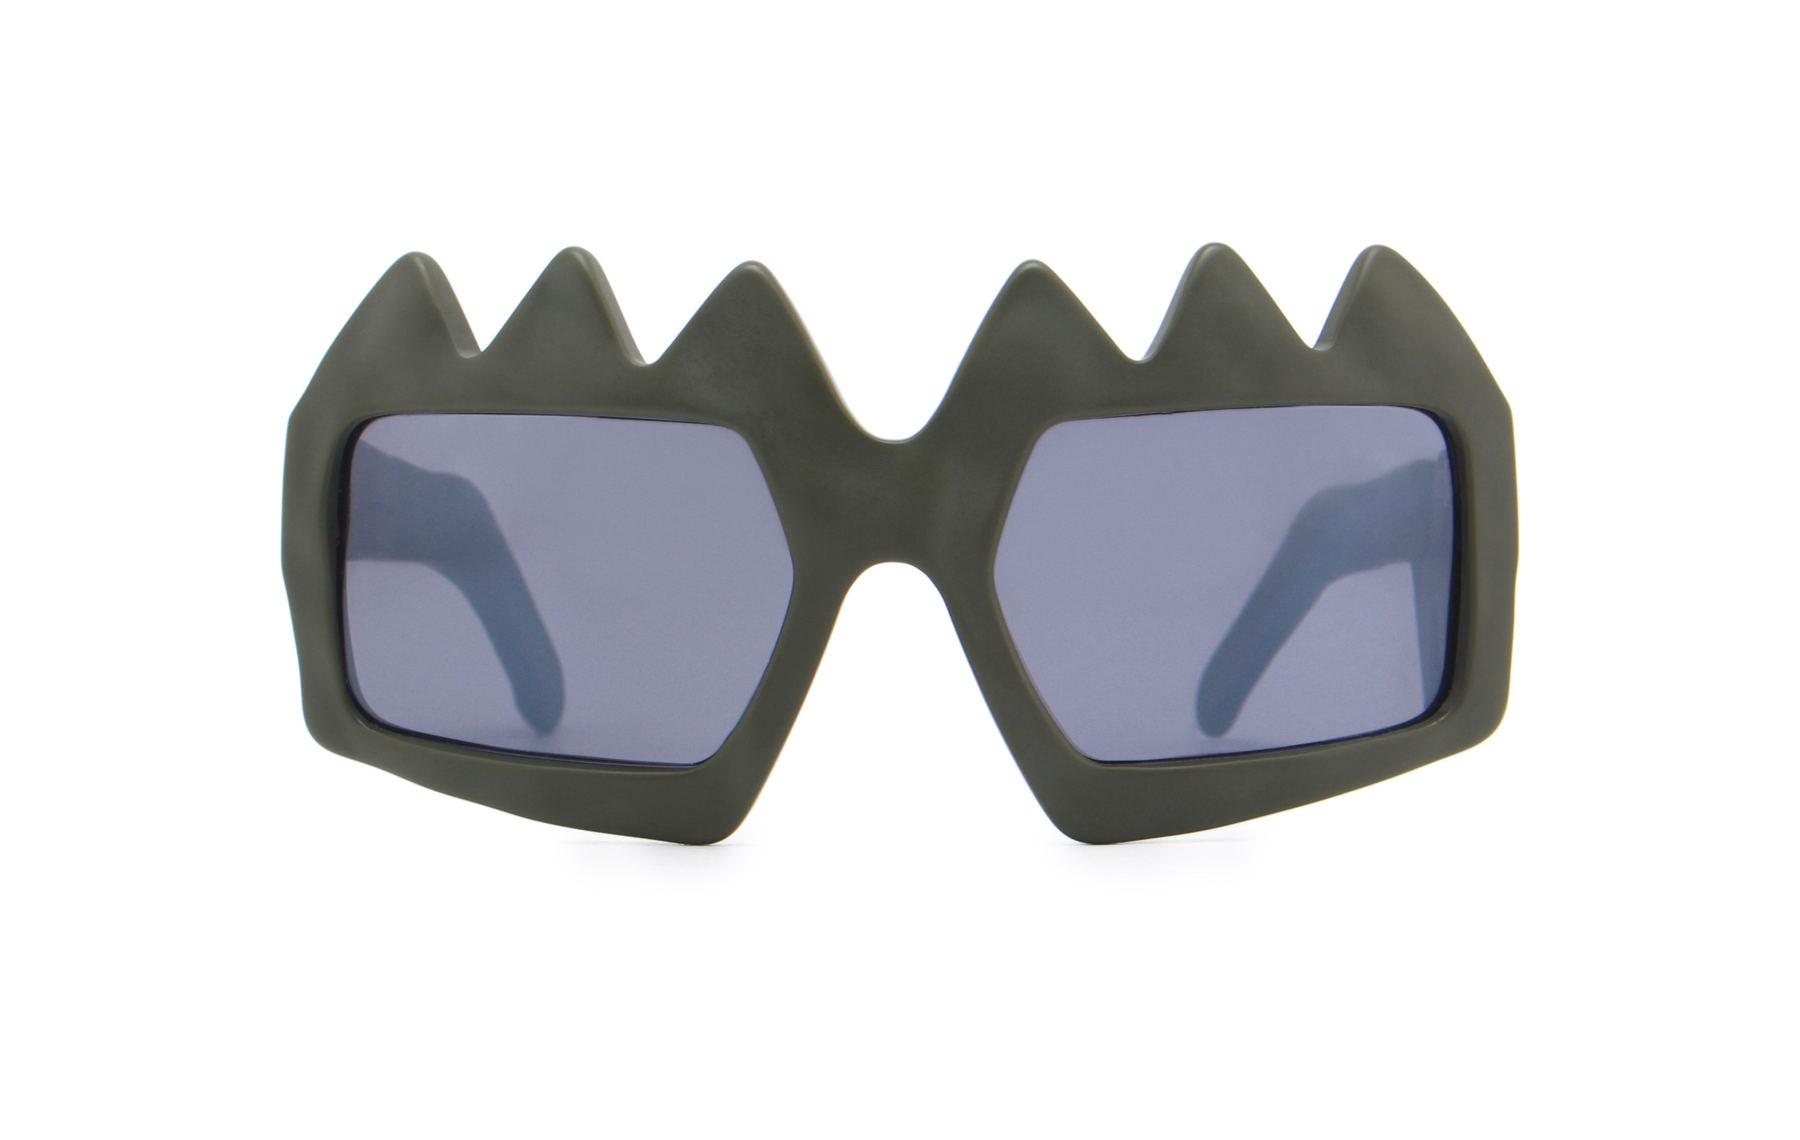 FAKBYFAK x Walter Van Beirendonck  Bliksem Sunglasses. Military Green Code: FBF-09-13-04